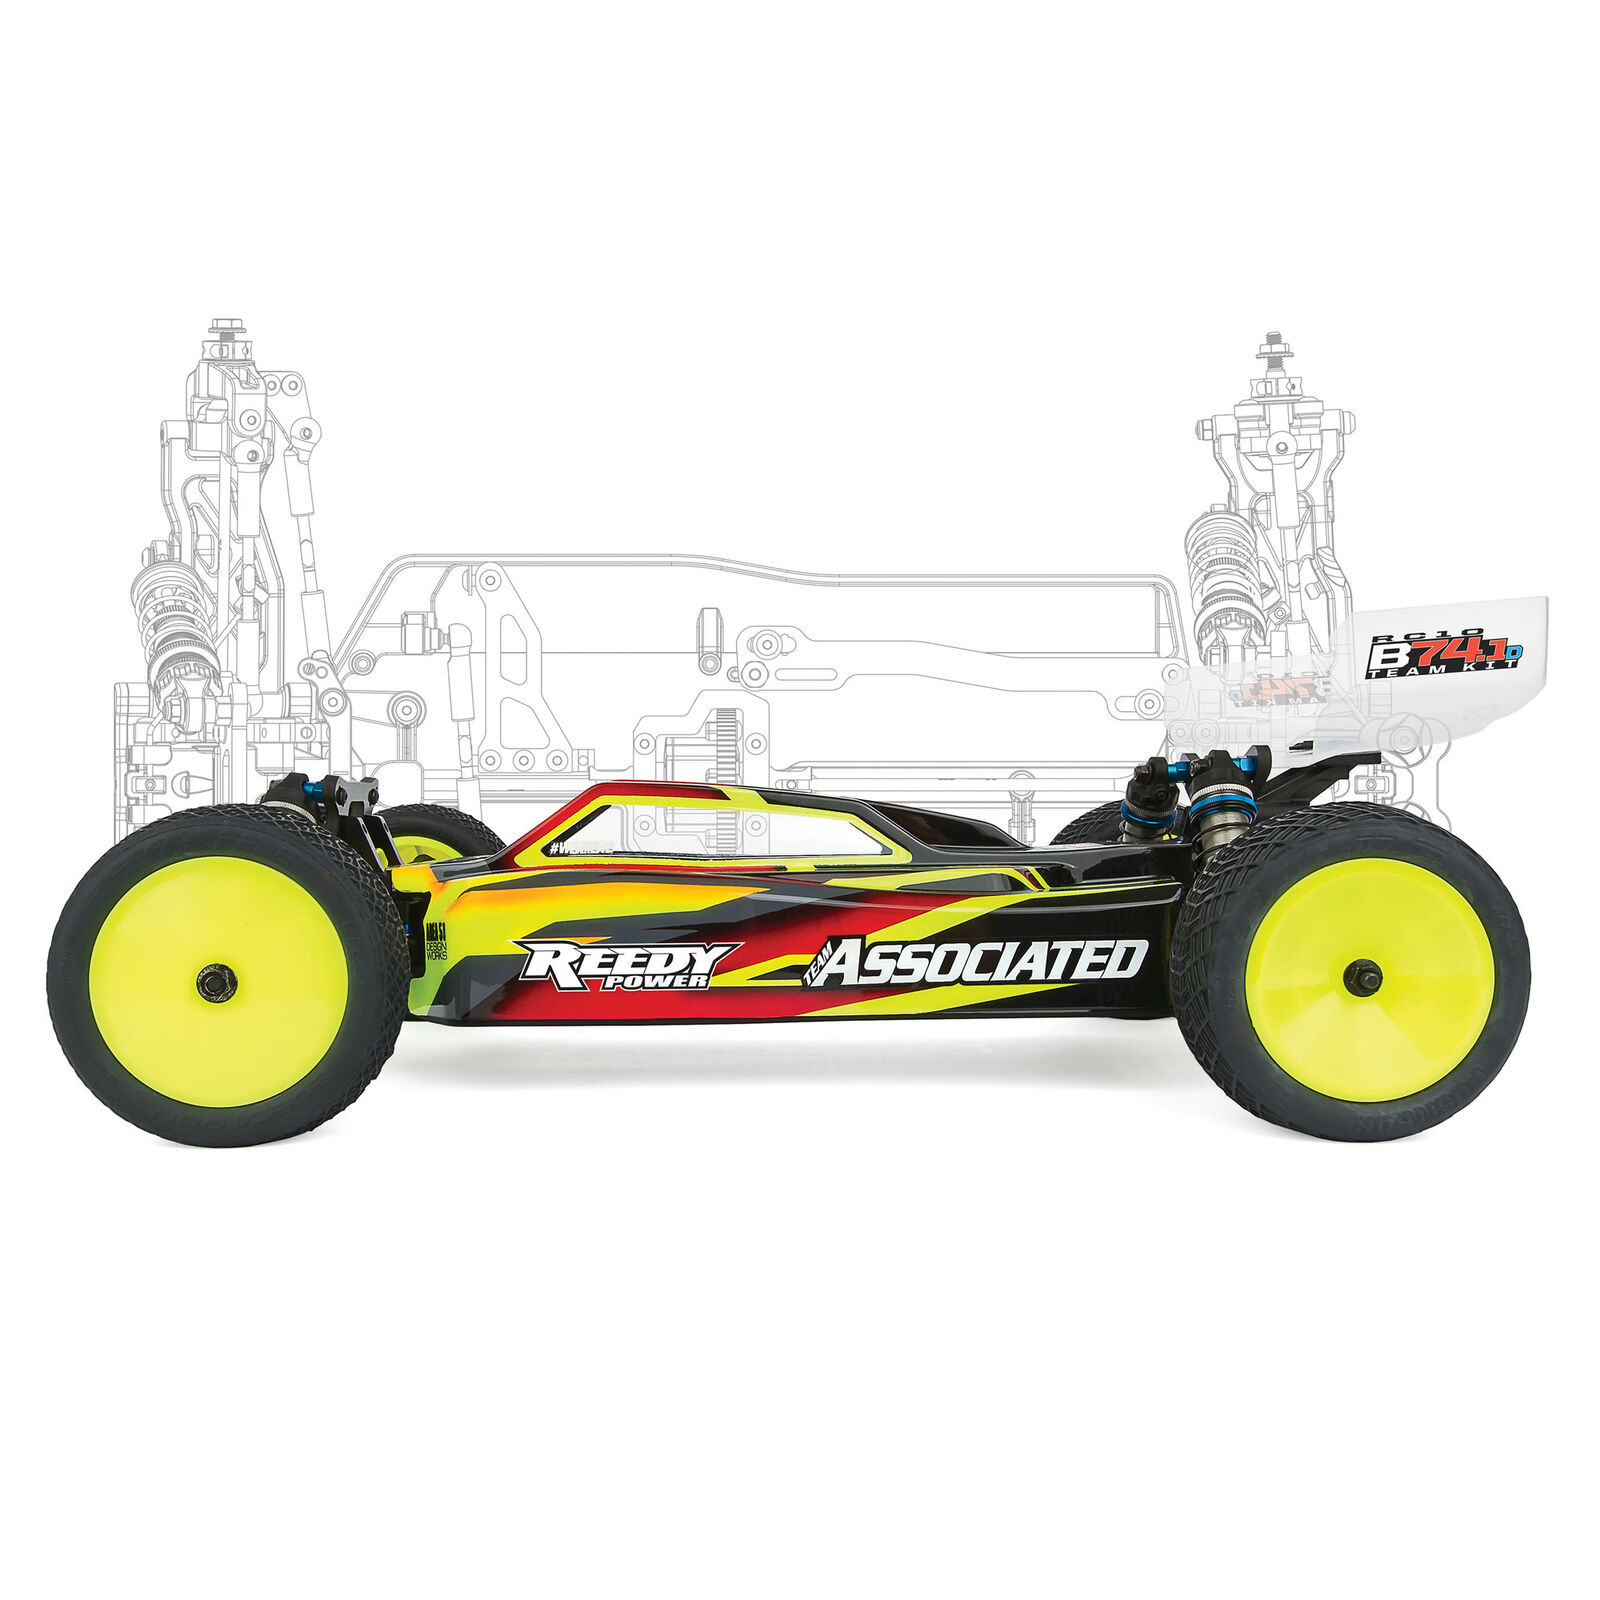 1/10 RC10B74.1D Buggy Team Kit